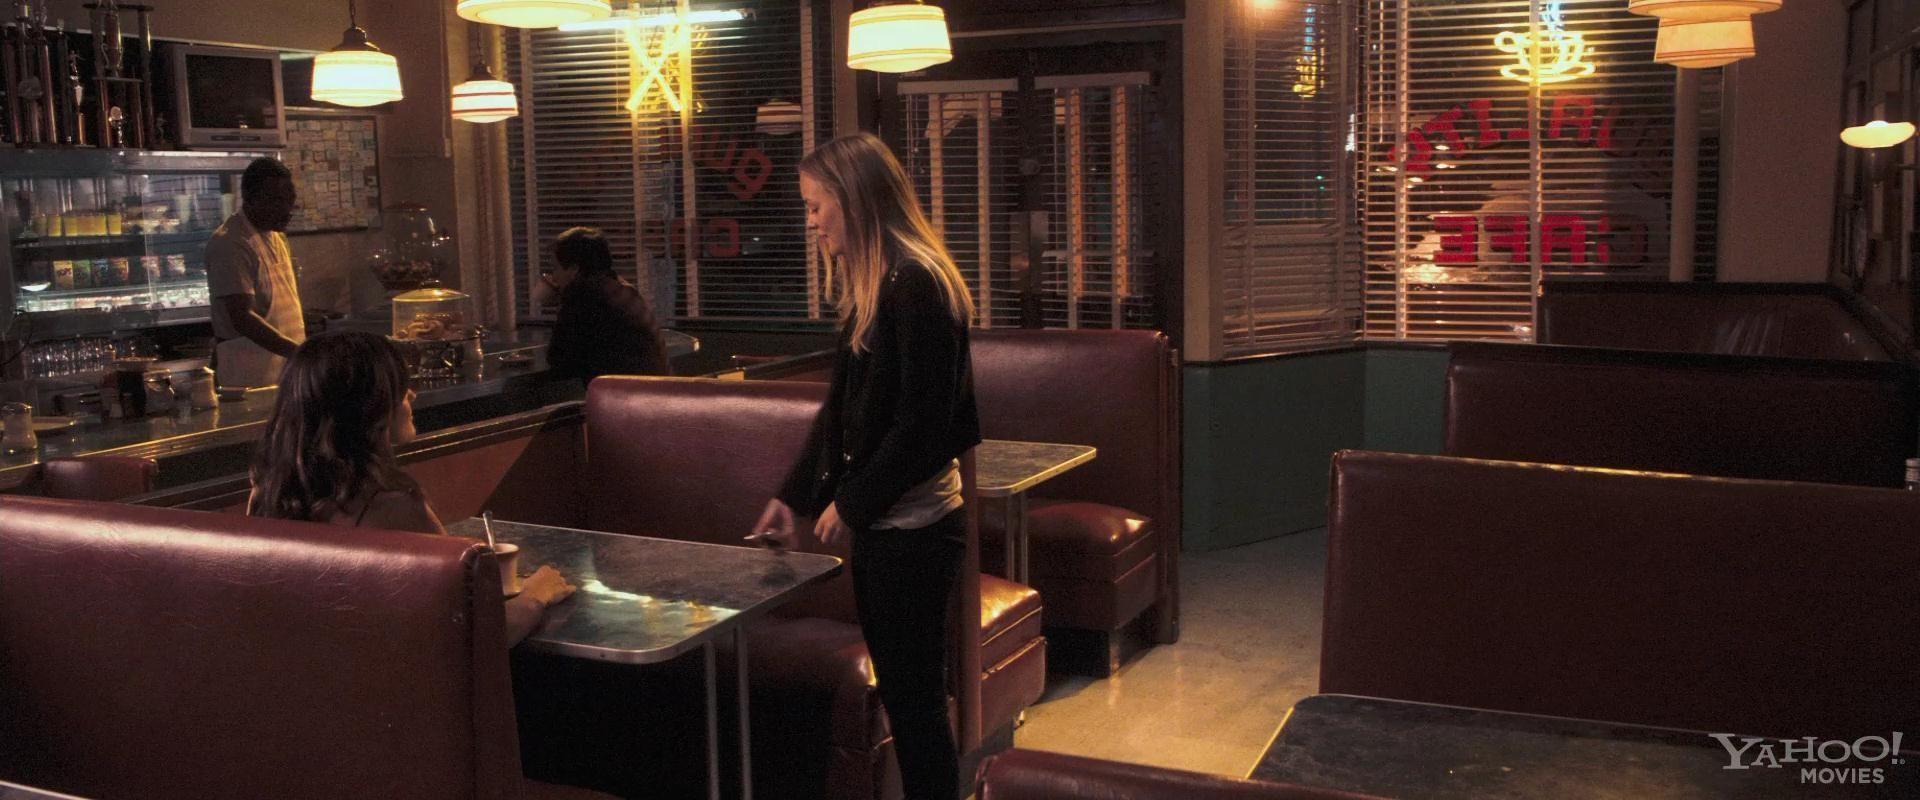 Trailer Gossip Girl saison 2 - da-kolkozcom